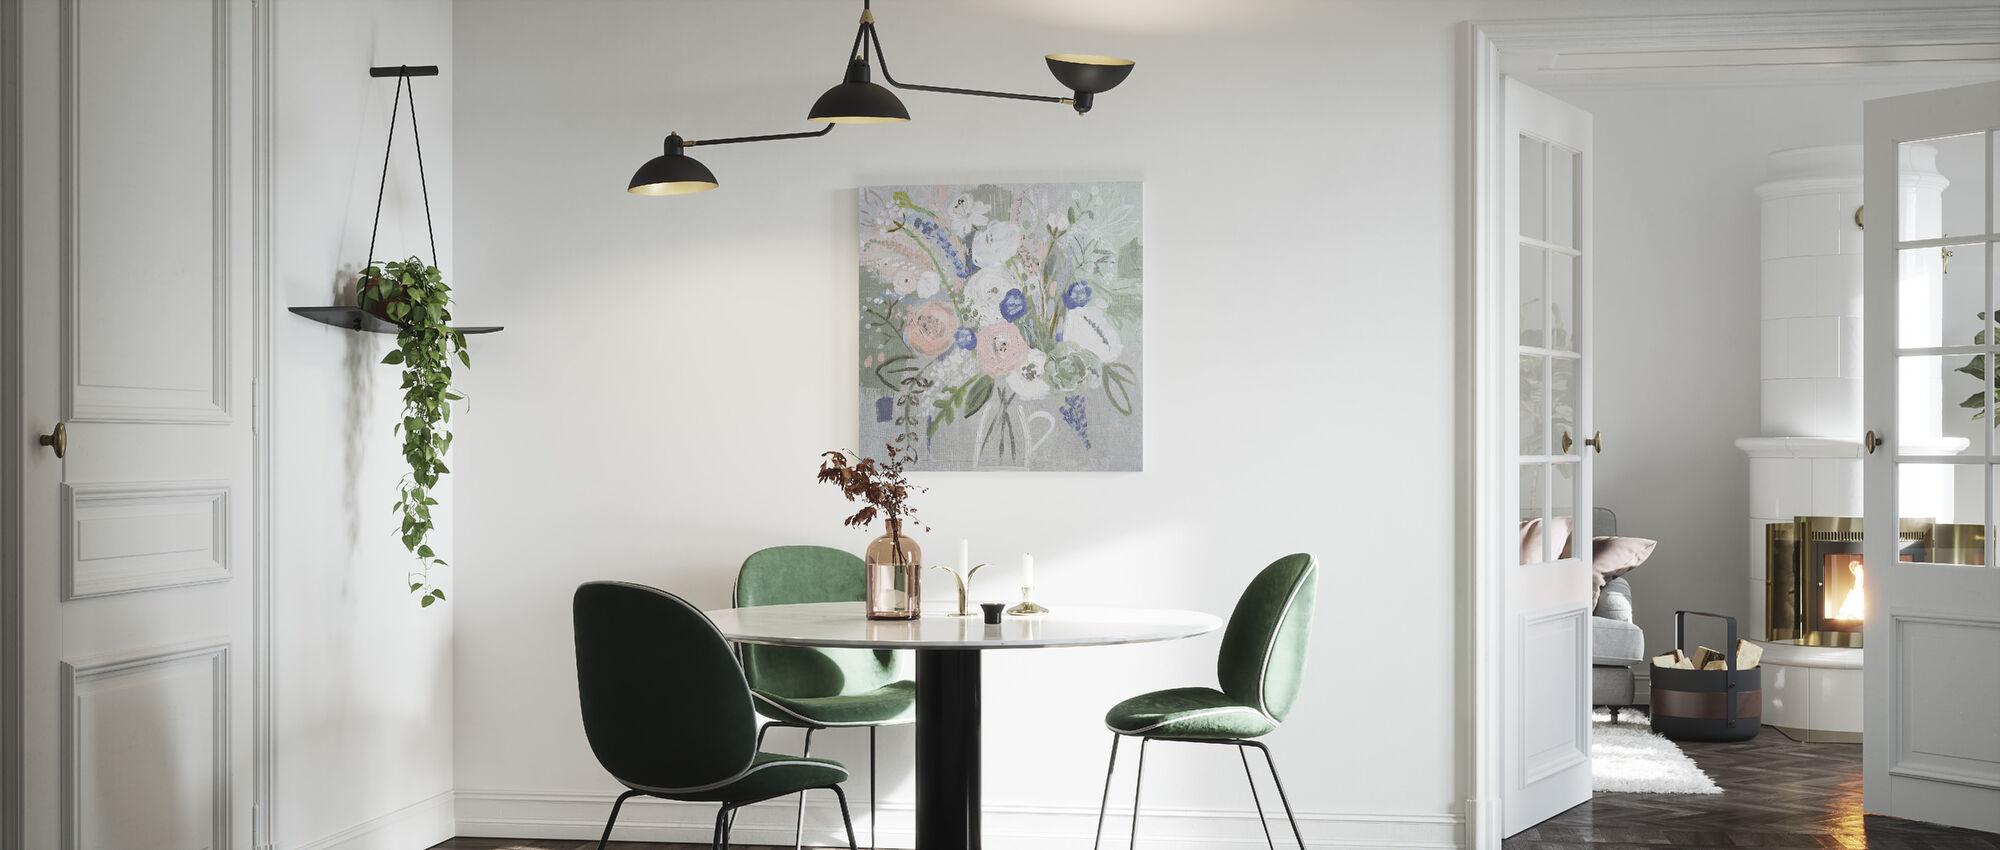 Floral Elegance - Canvas print - Kitchen